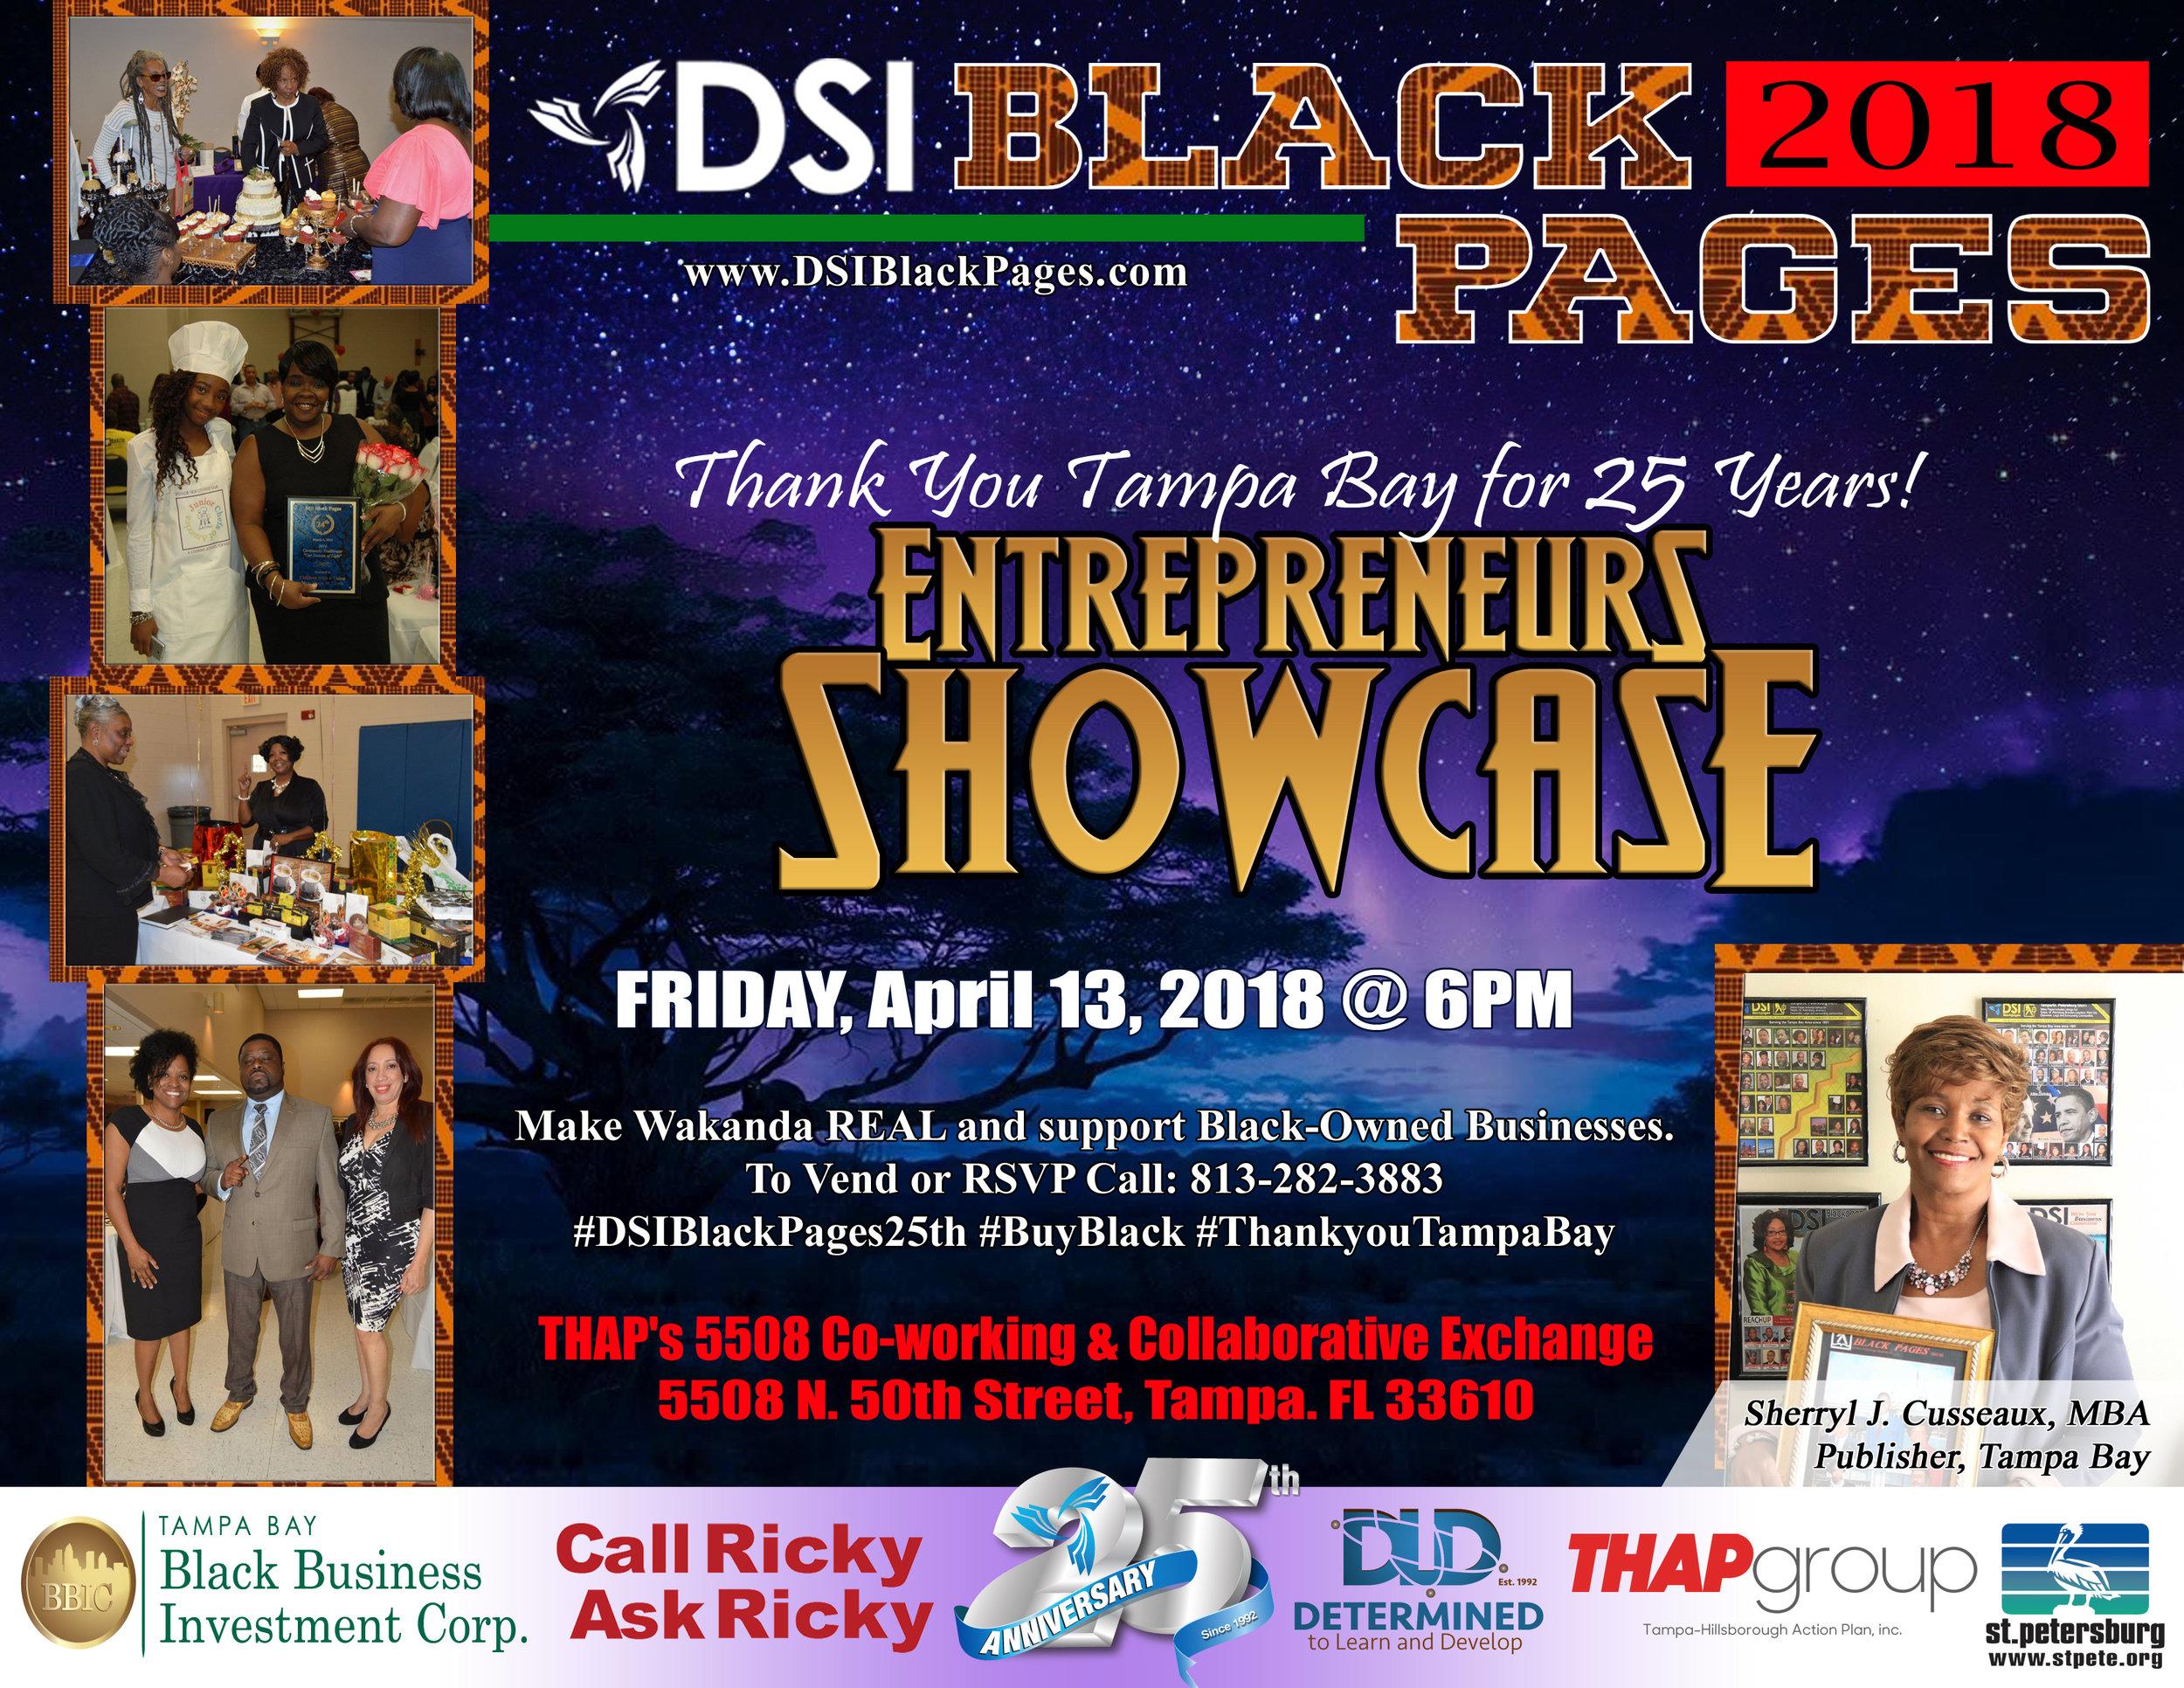 DSI_BlackPages_Showcase_2018.jpg